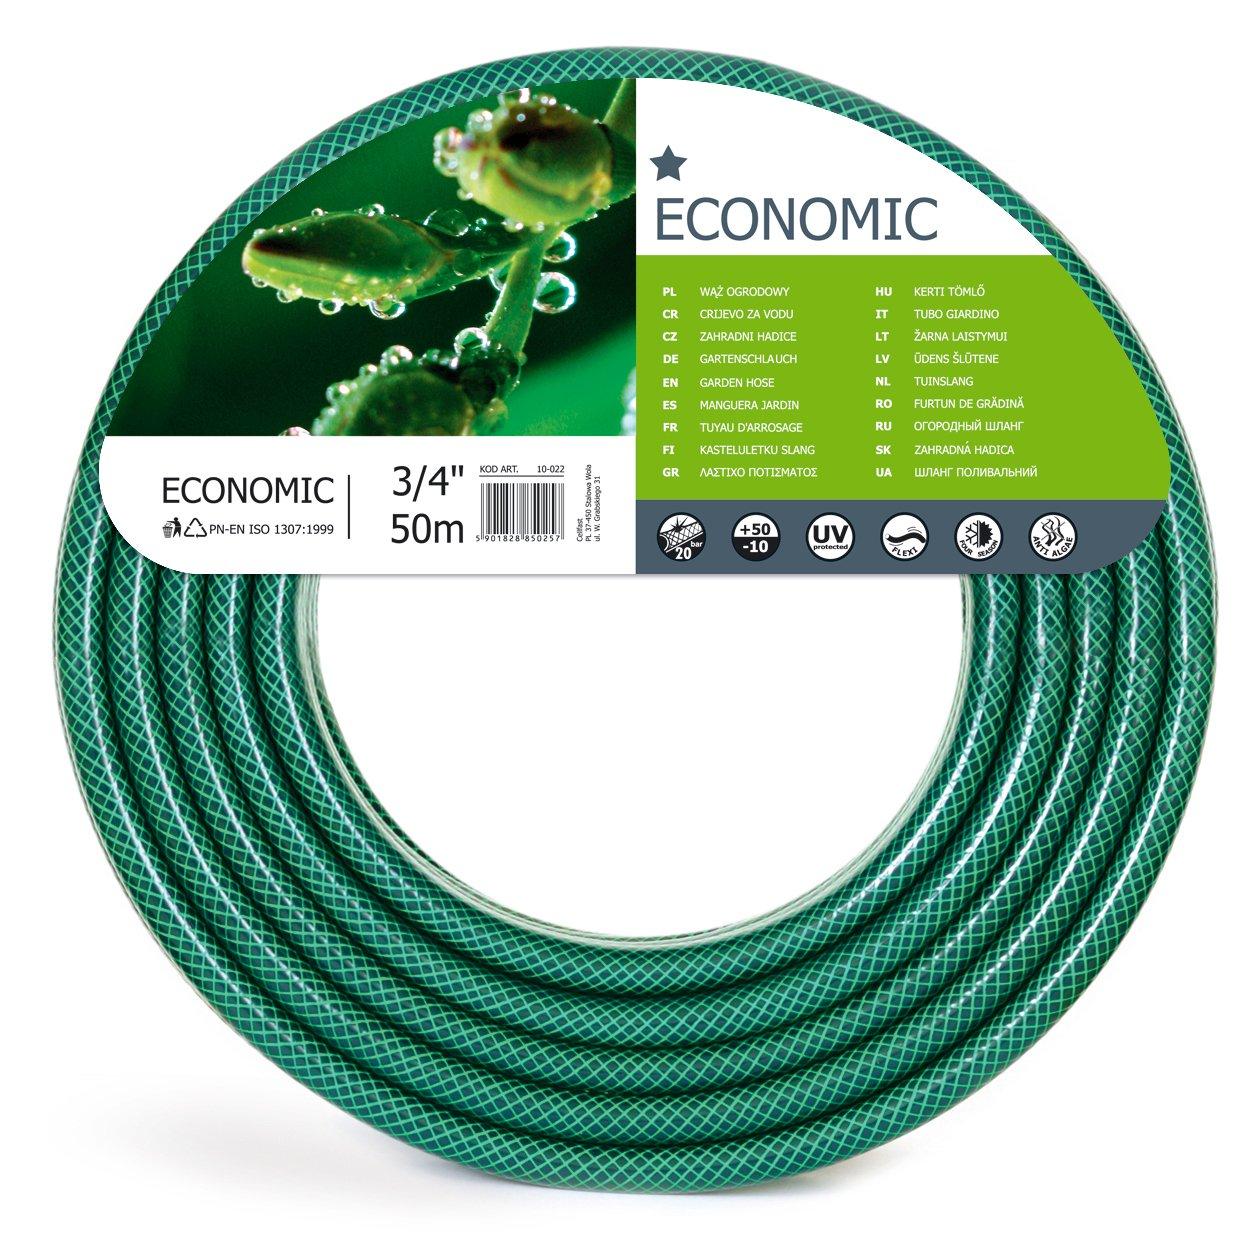 Terra Economic garden hose green 34 50m Amazoncouk Garden